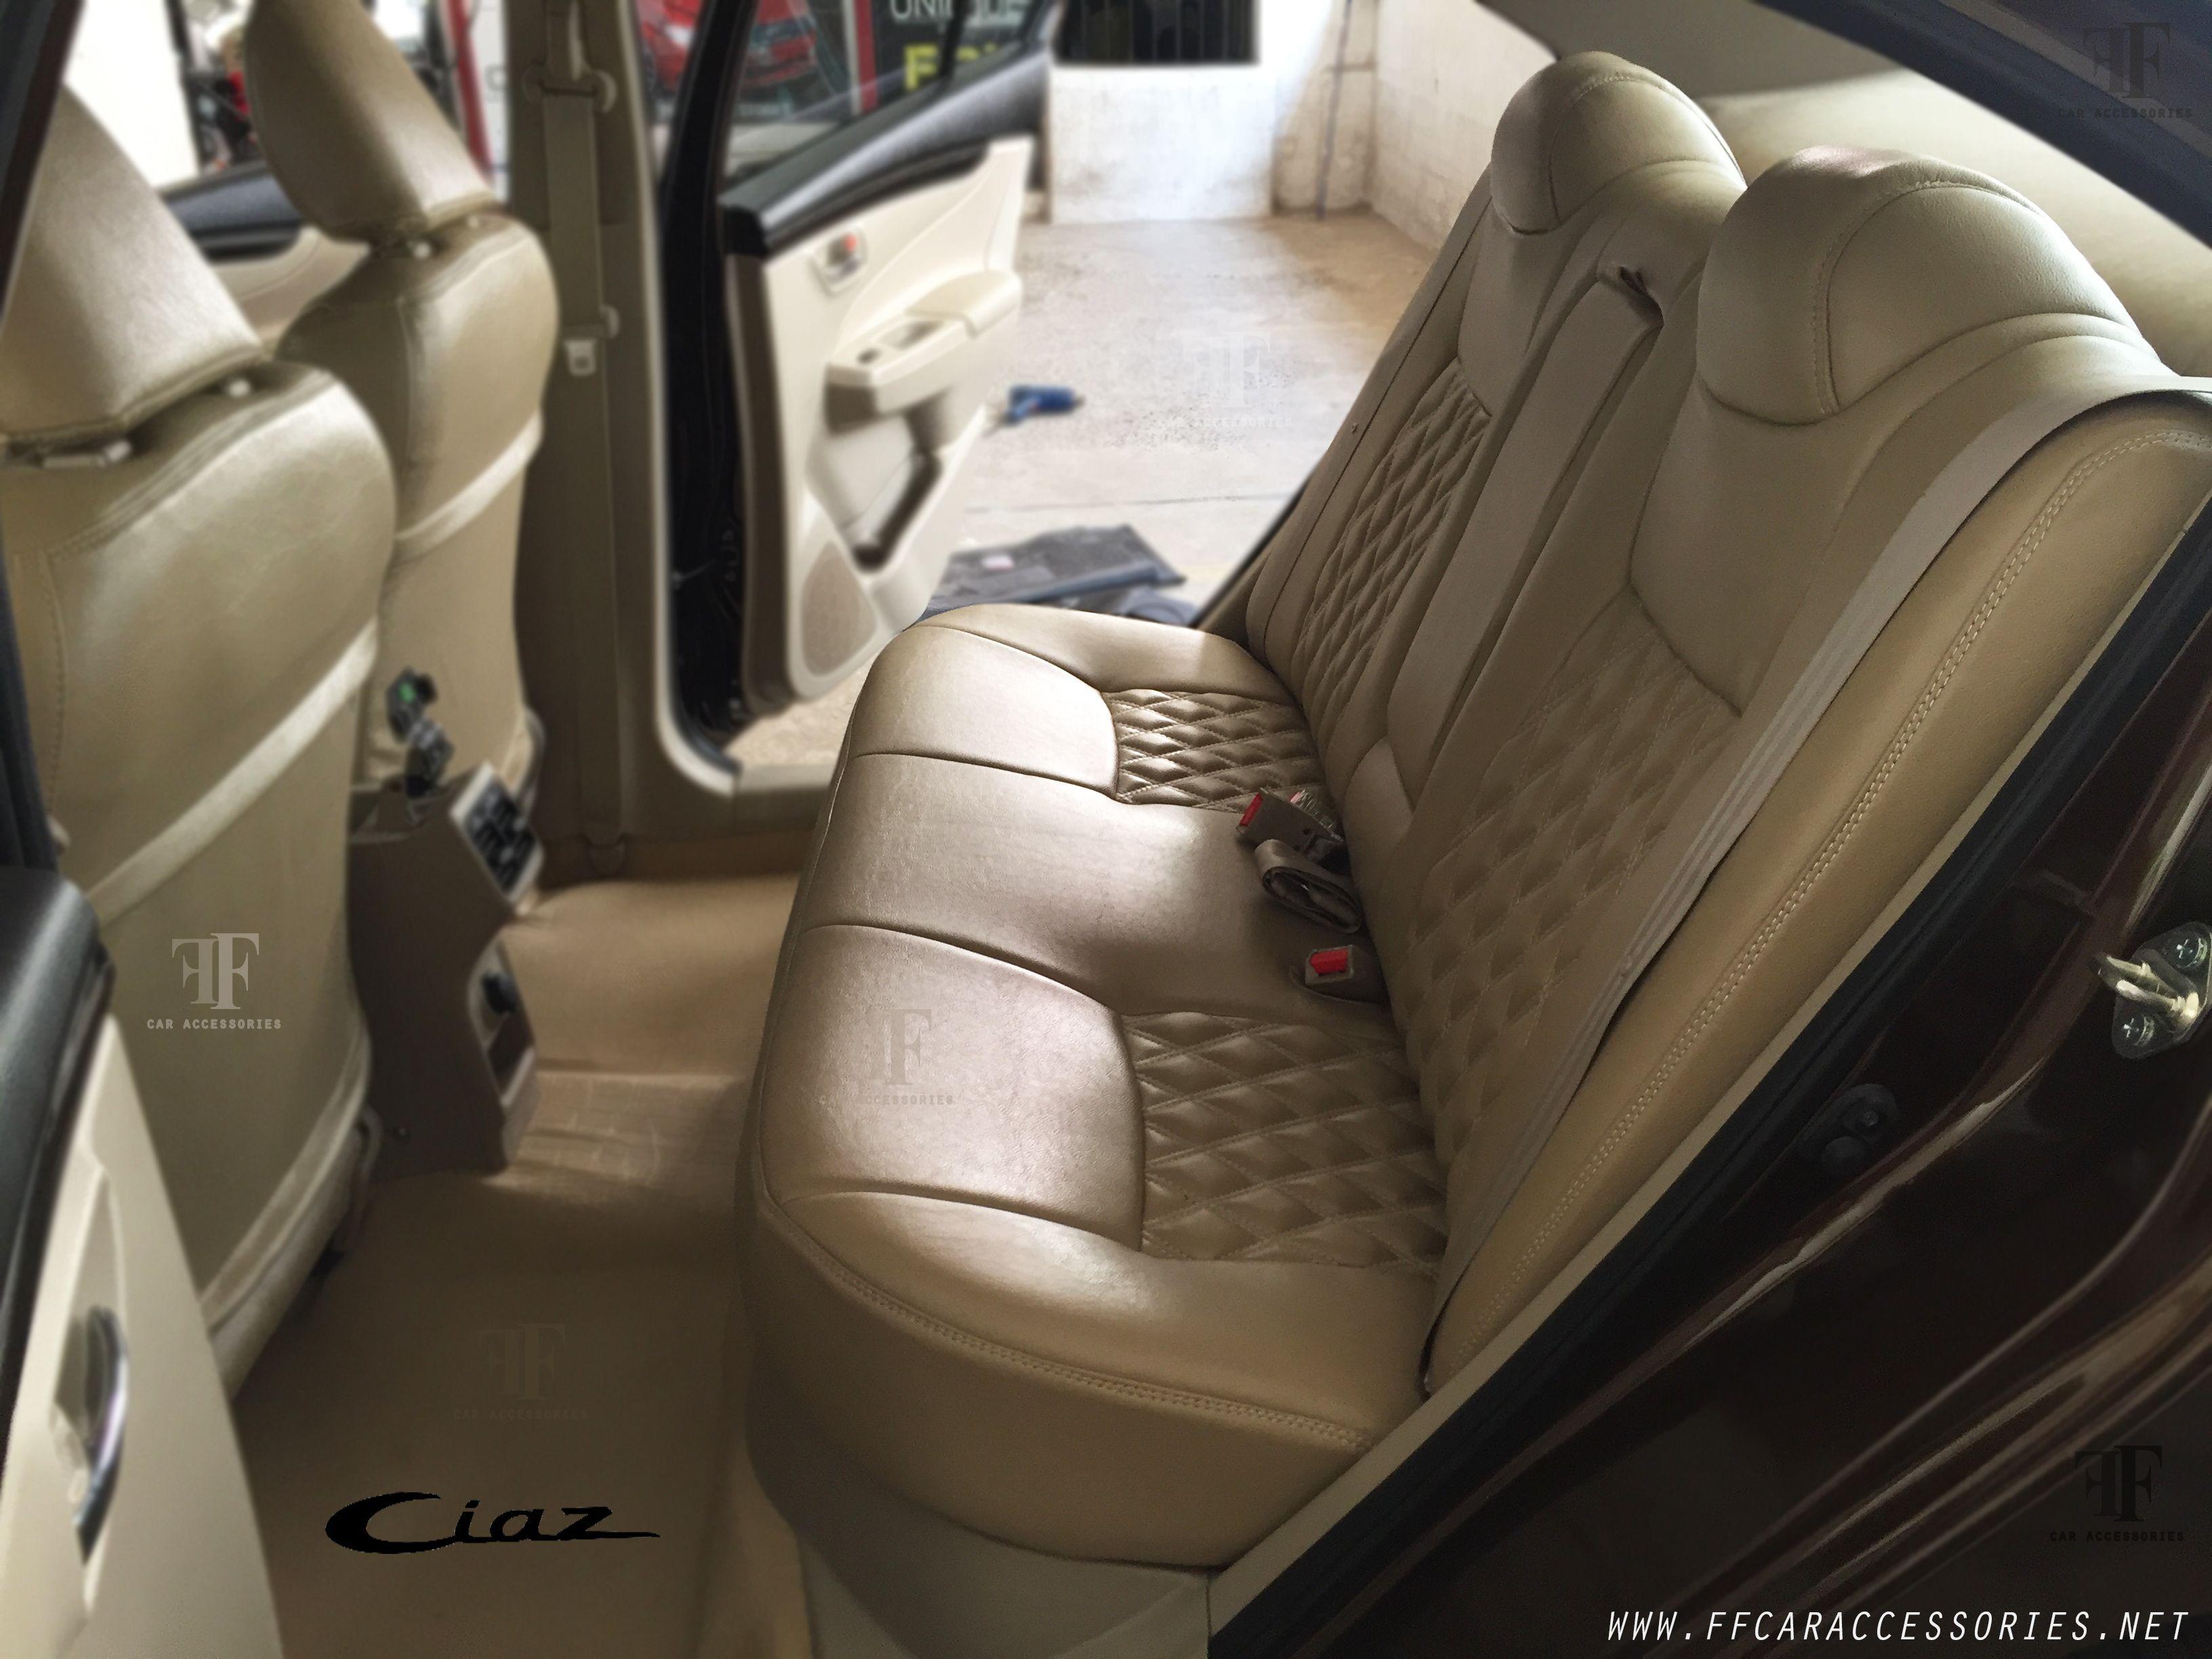 Rear seat view maruti suzuki ciaz